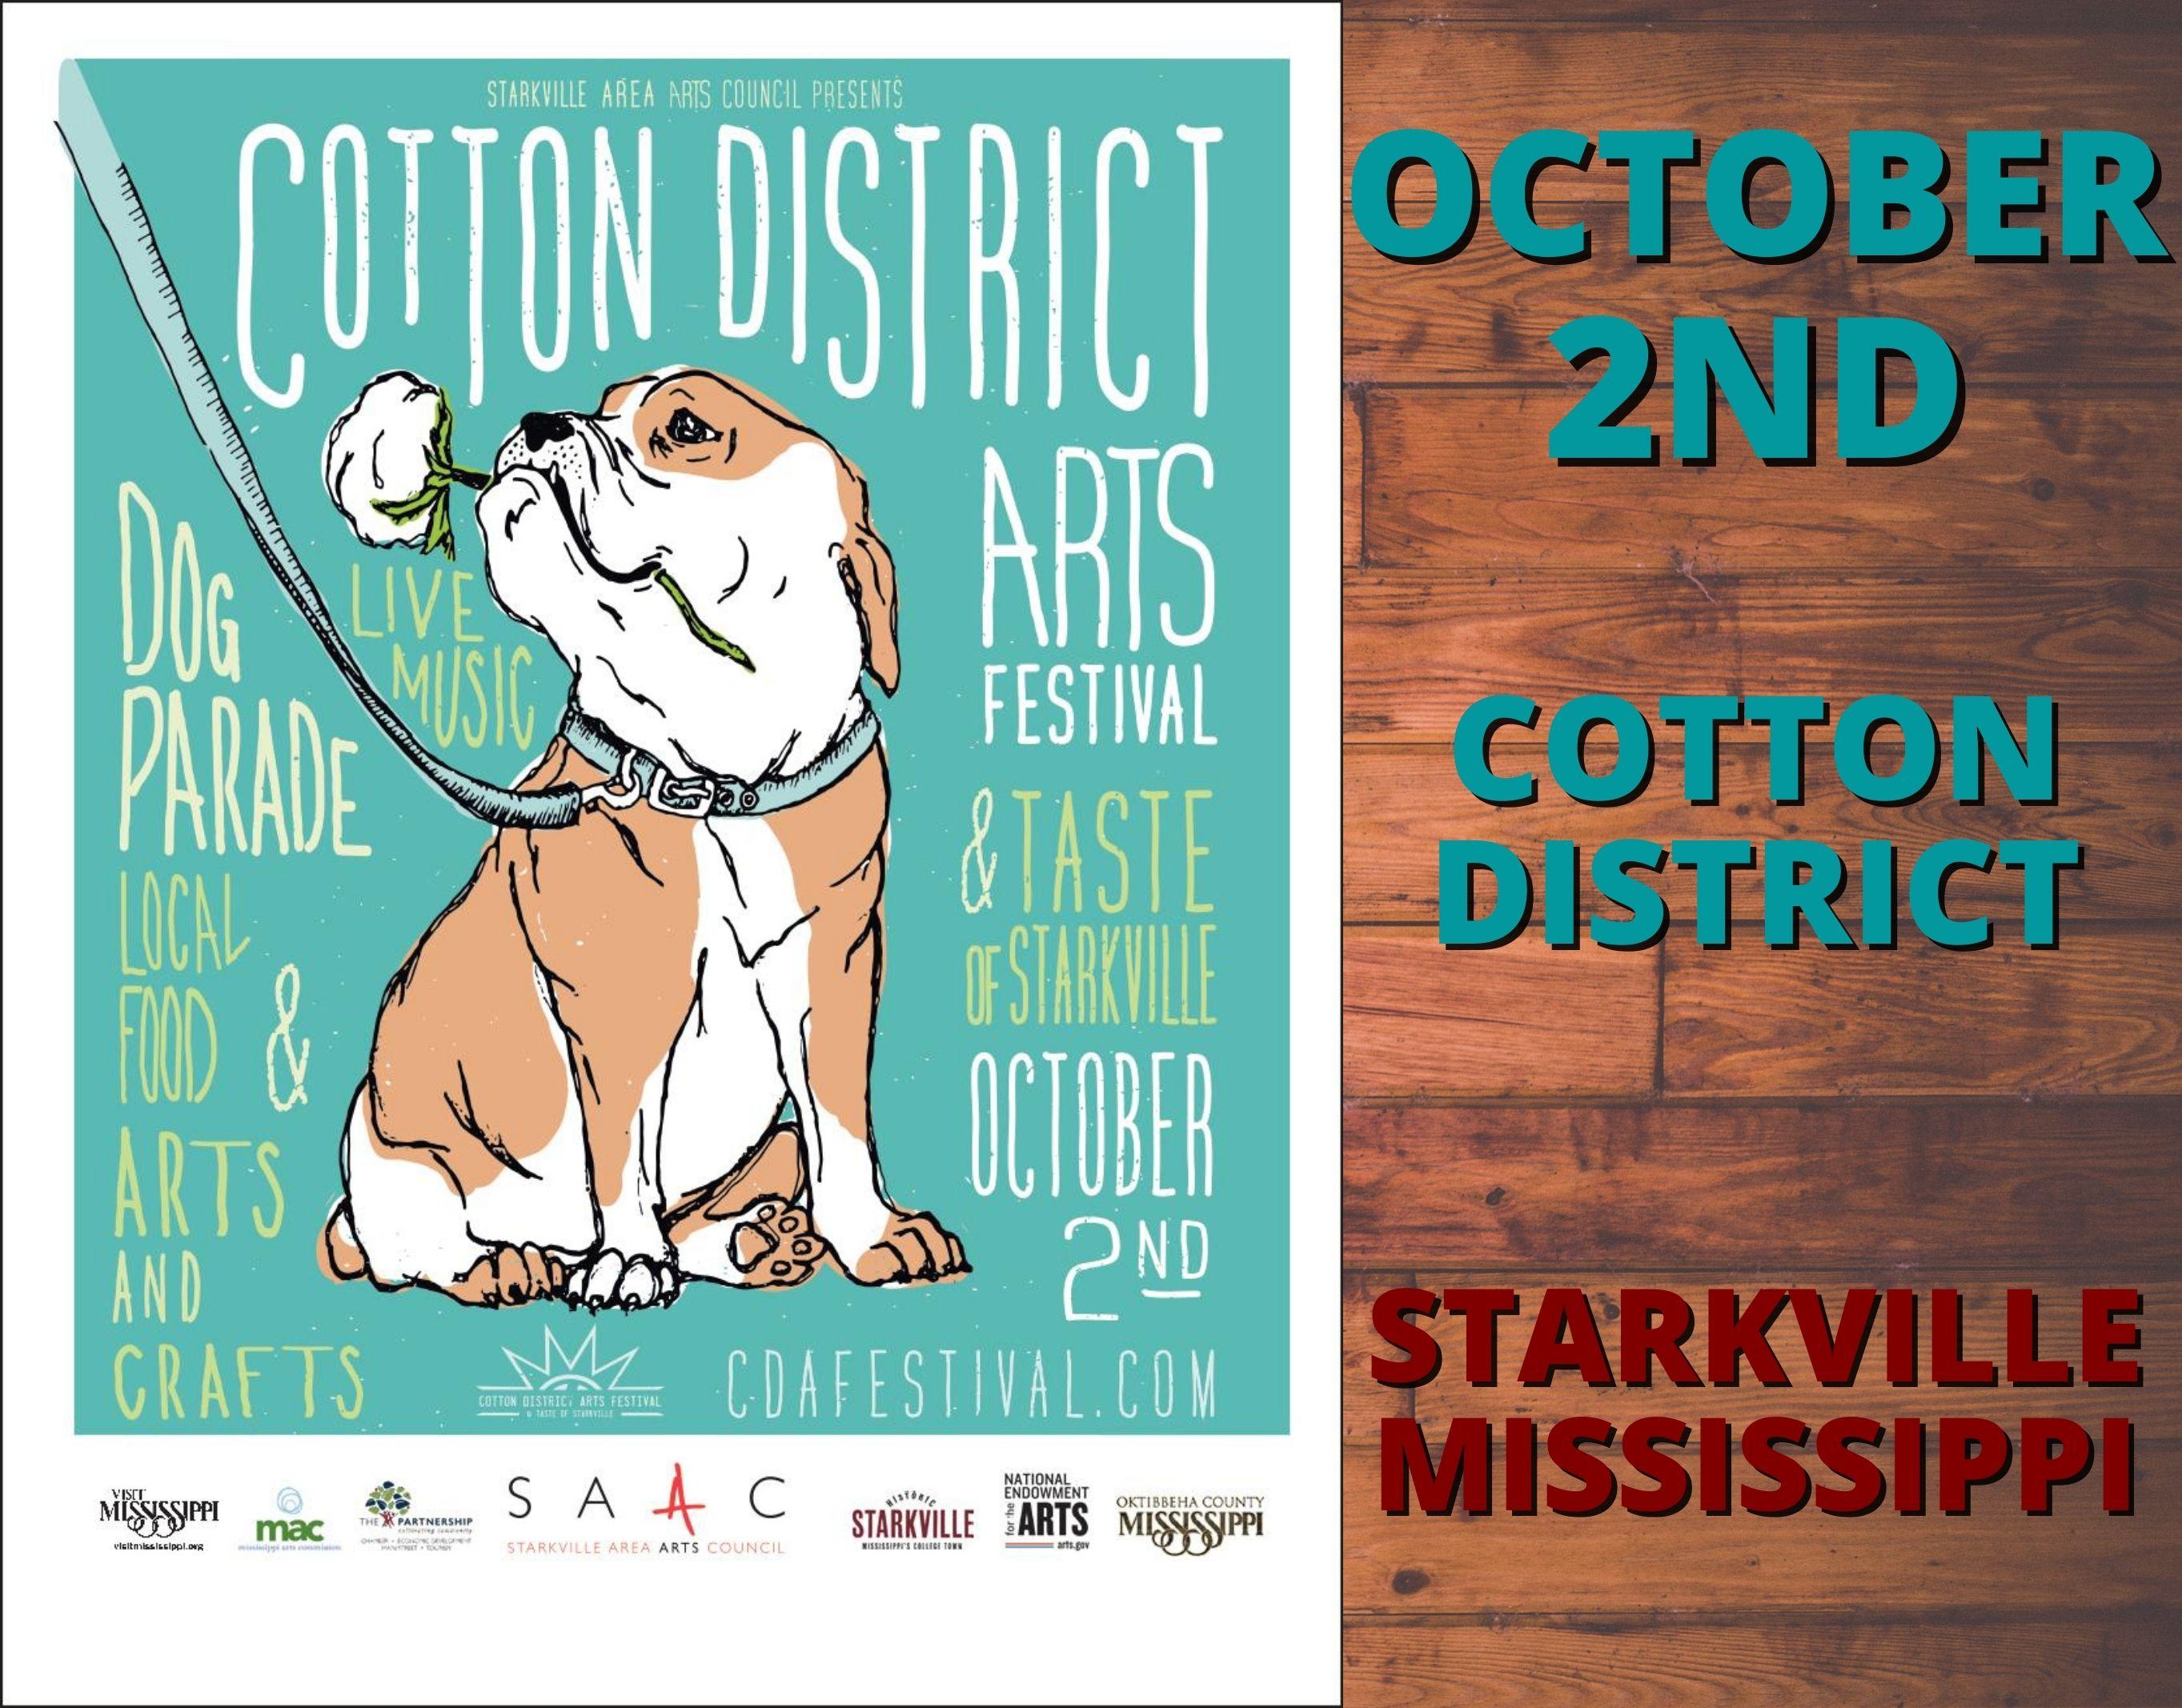 Cotton District Arts Festival-Oct. 2nd